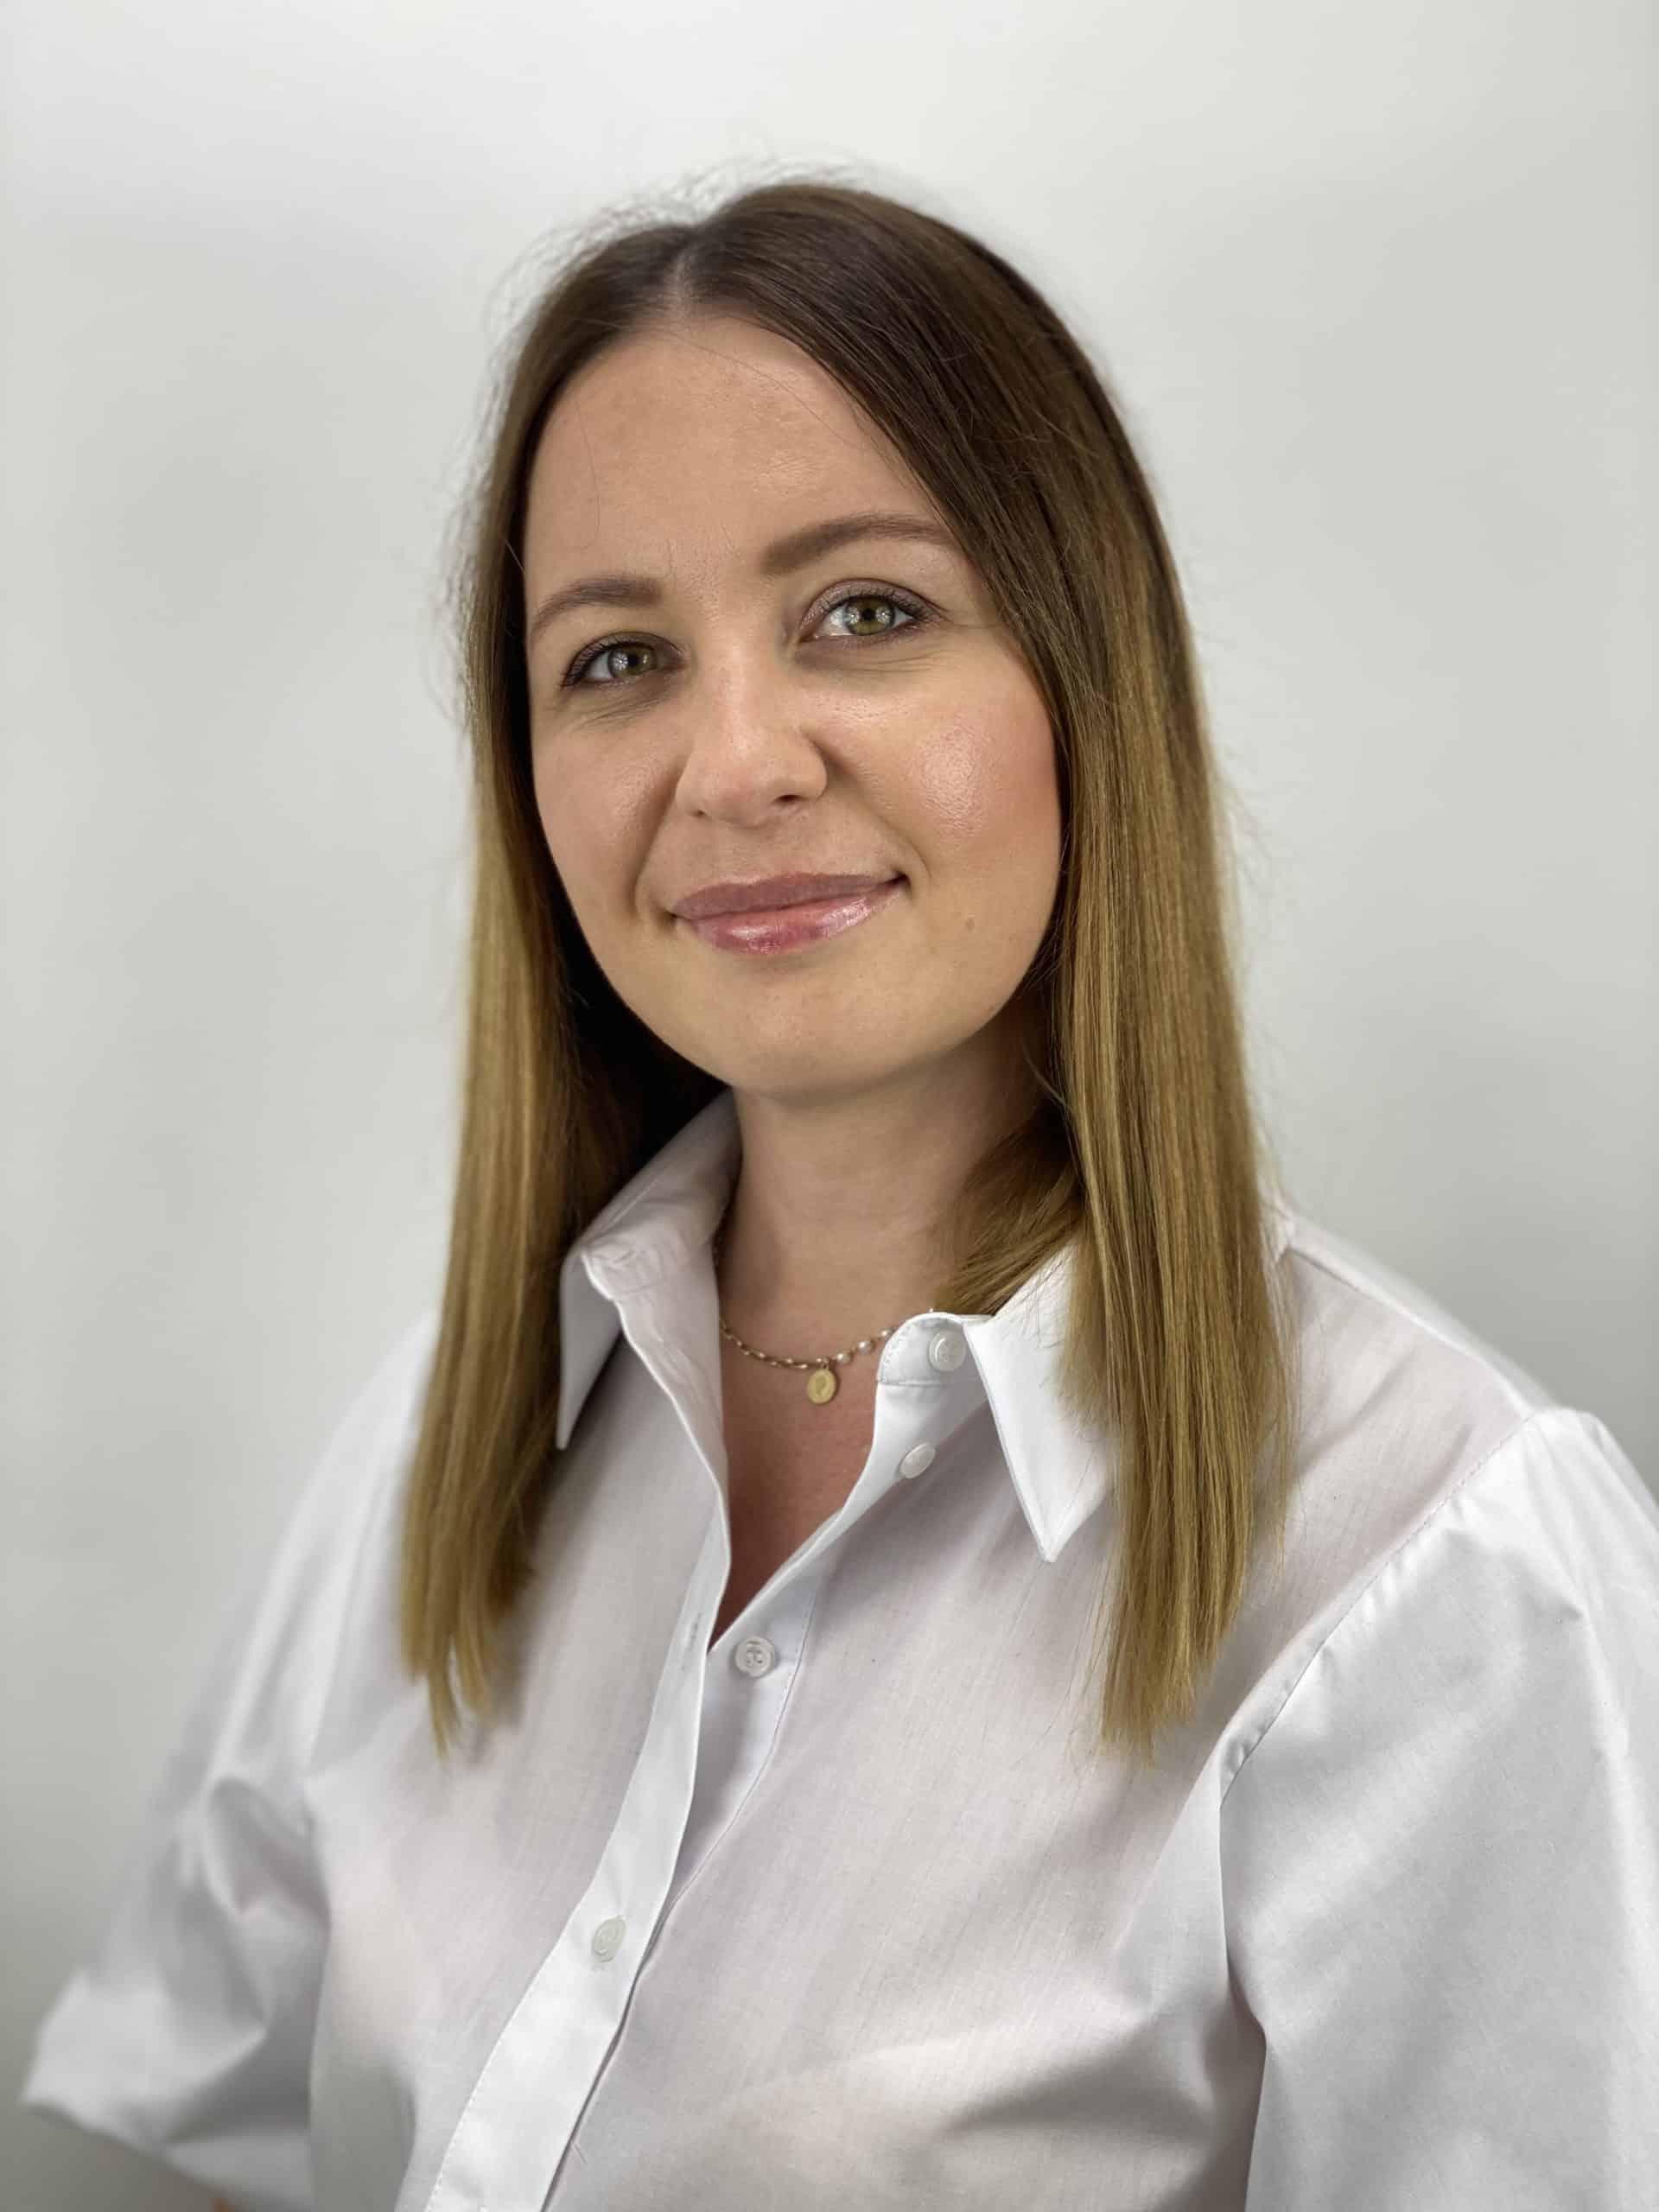 Dyrektor Karolina Kluza